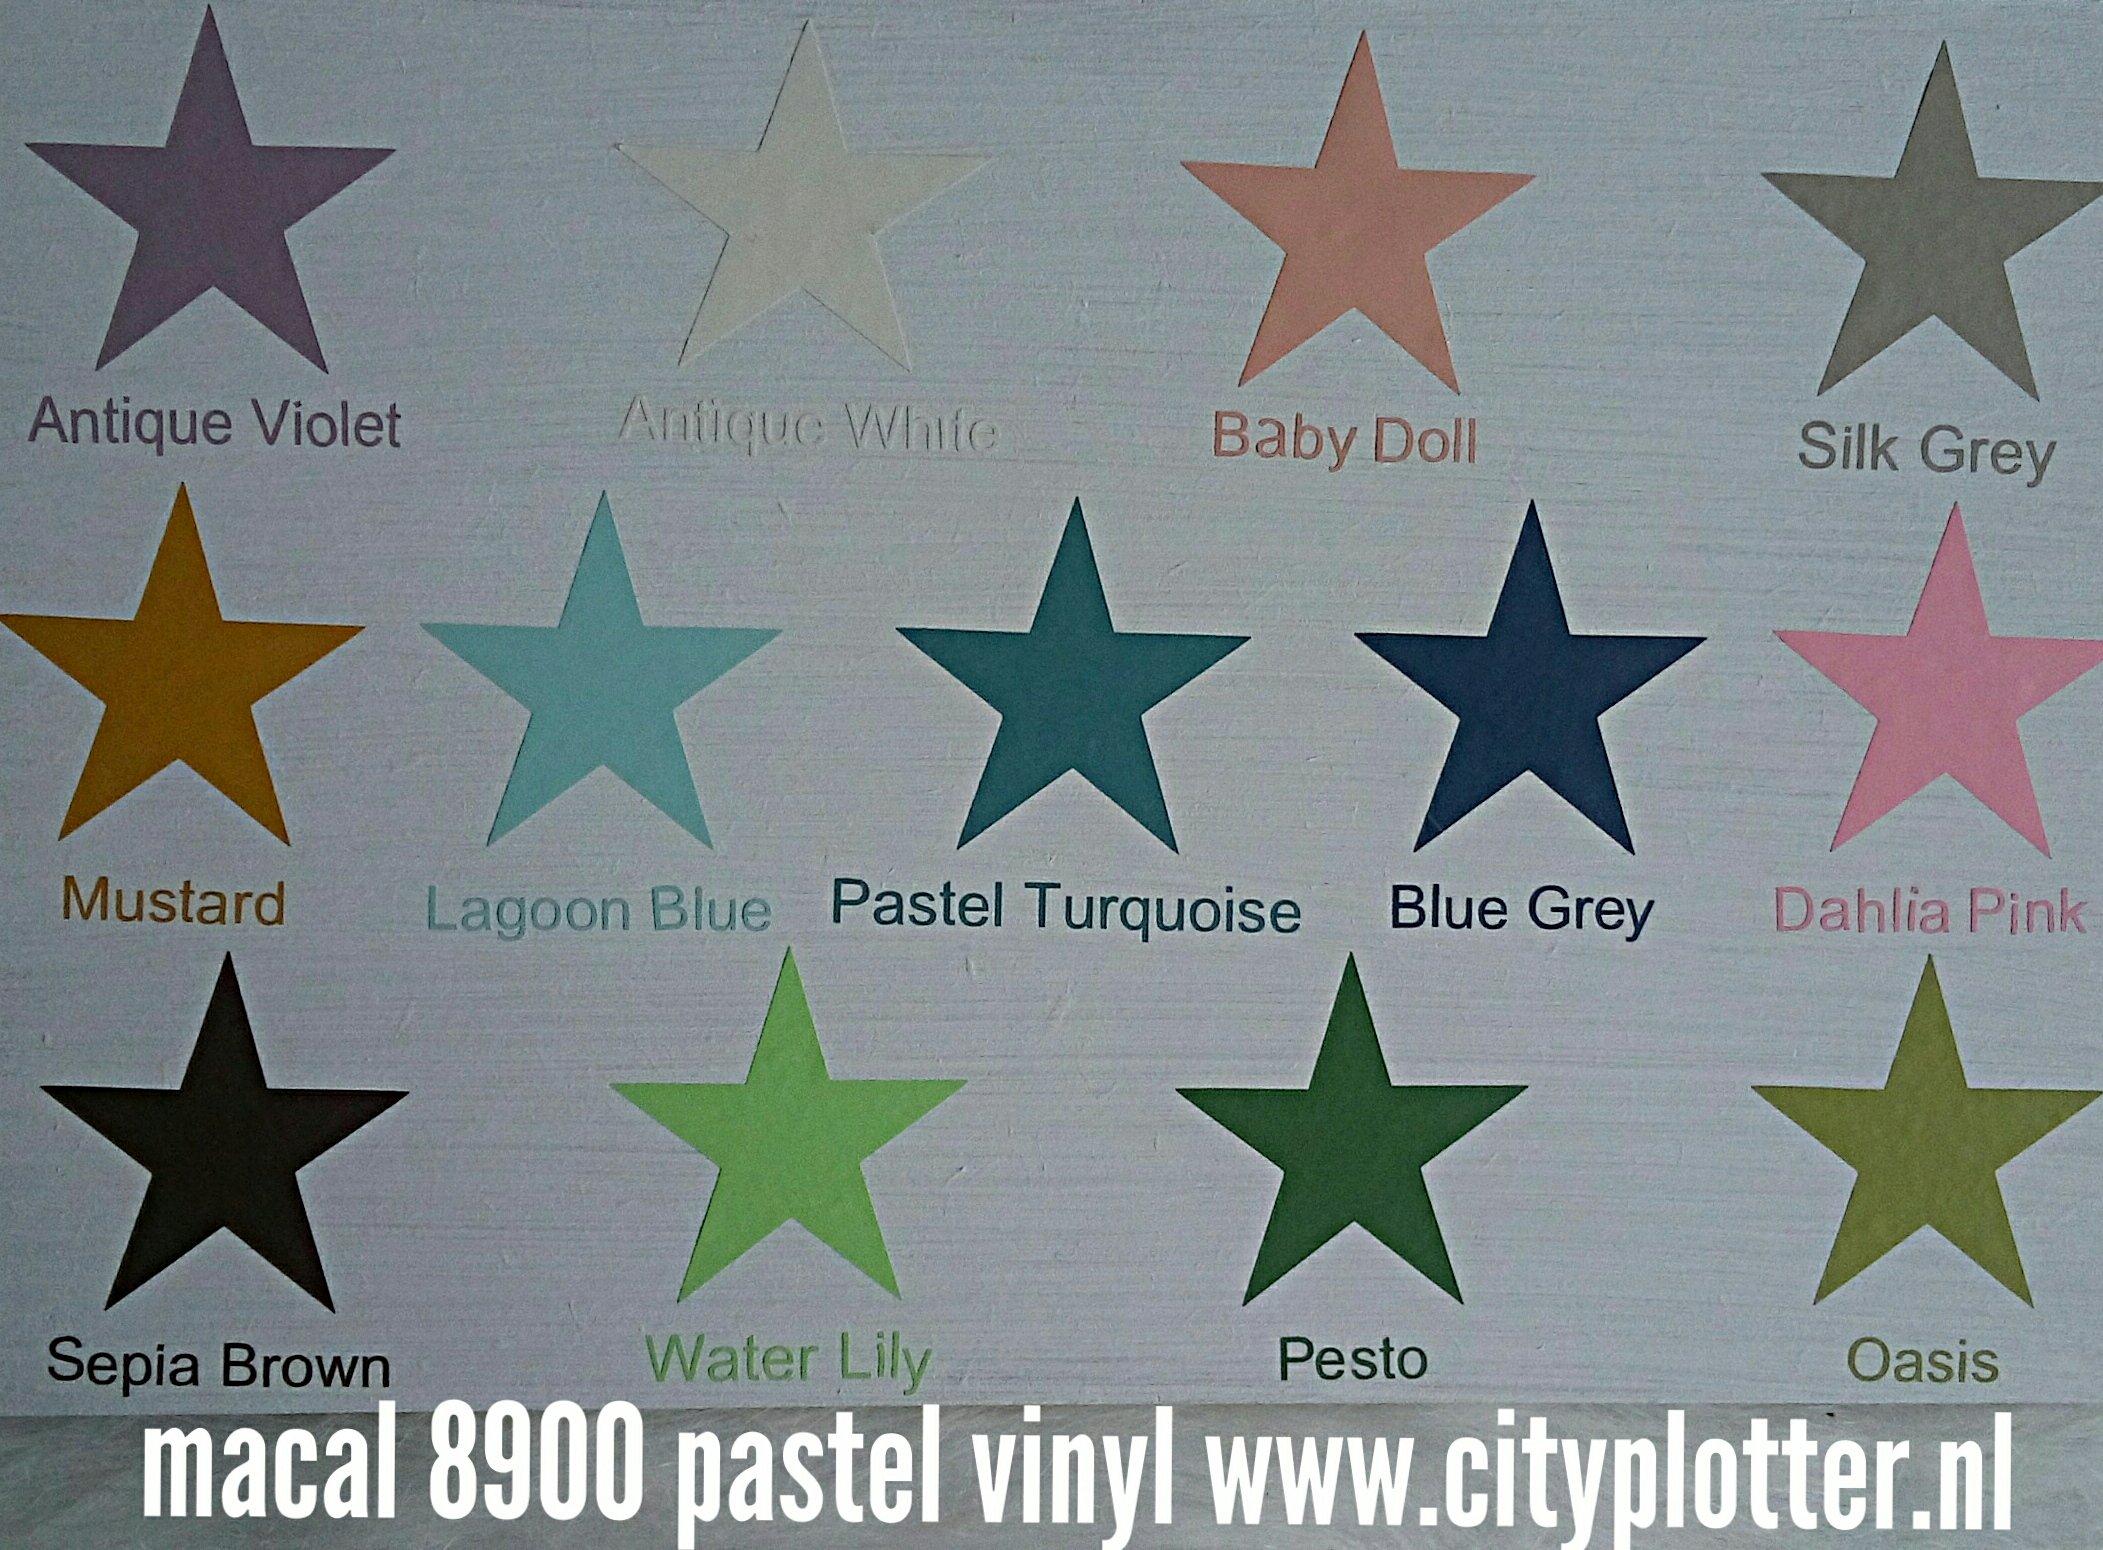 Goedkope Vinyl Restanten : Vinylfolie u2013 cityplotter